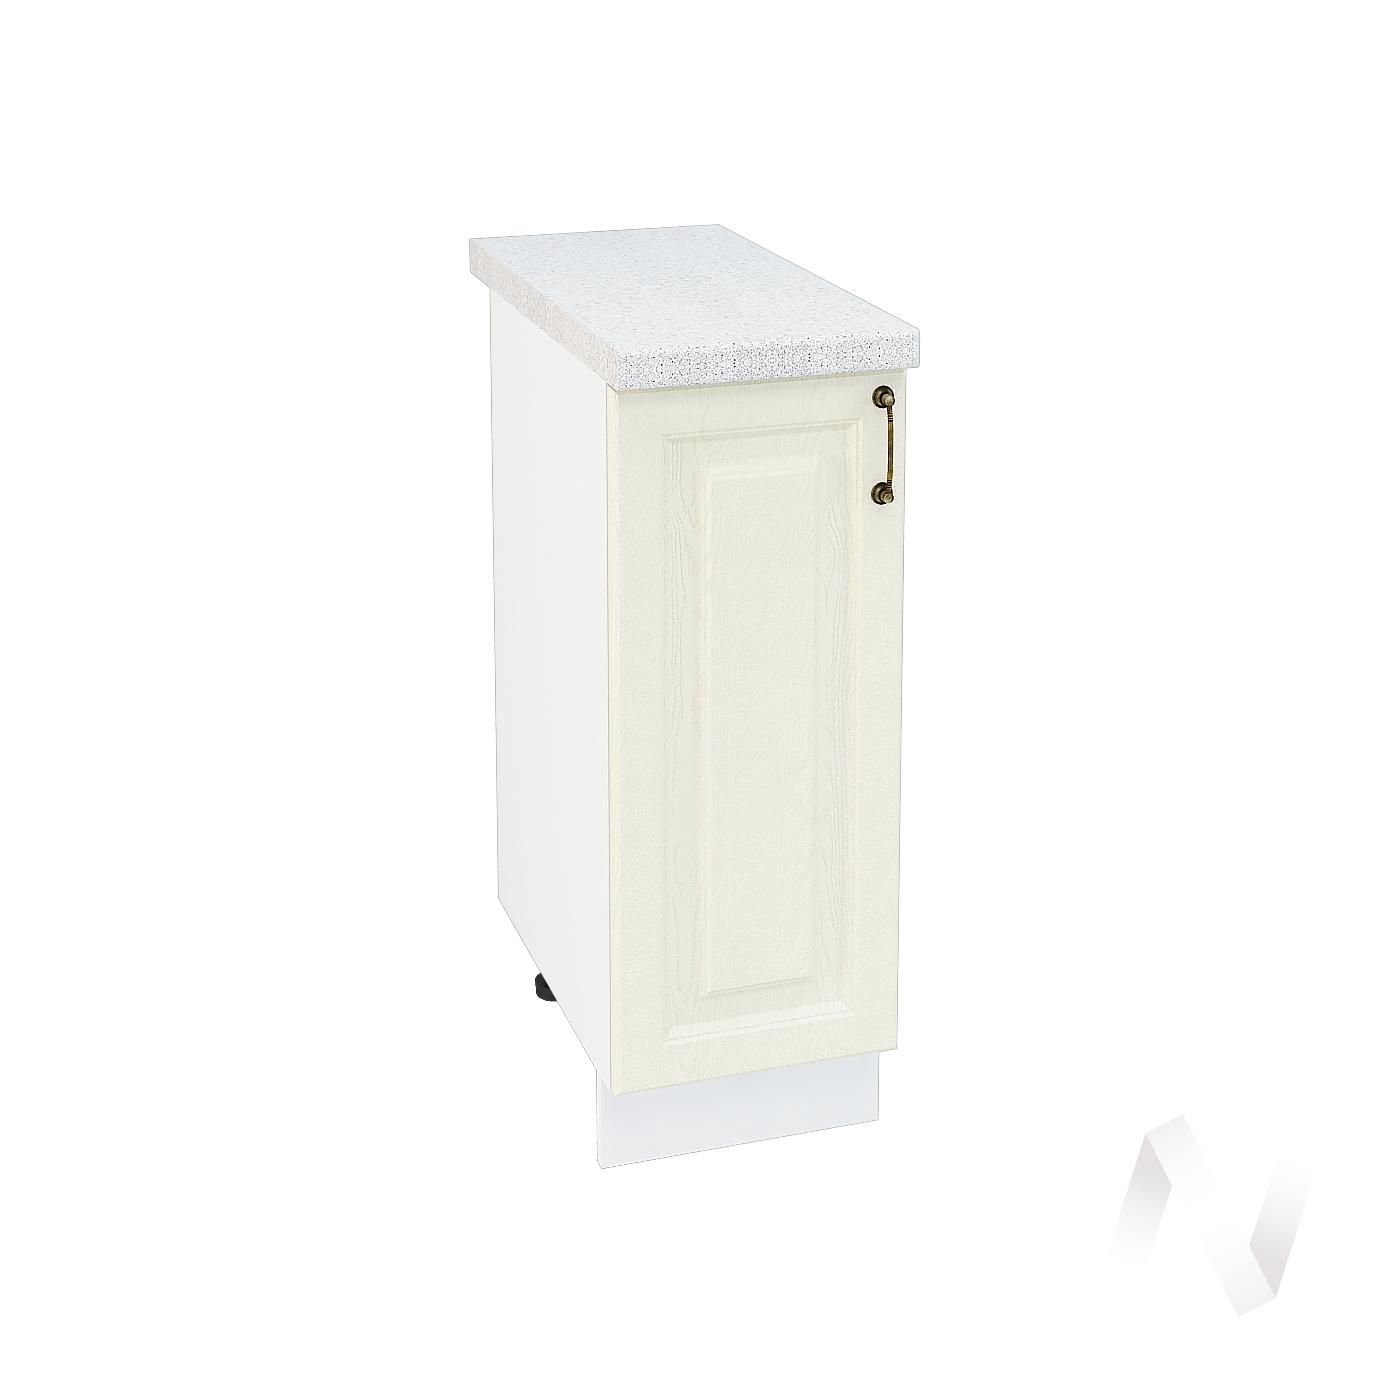 "Кухня ""Ницца"": Шкаф нижний 300, ШН 300 (Крем/корпус белый)"